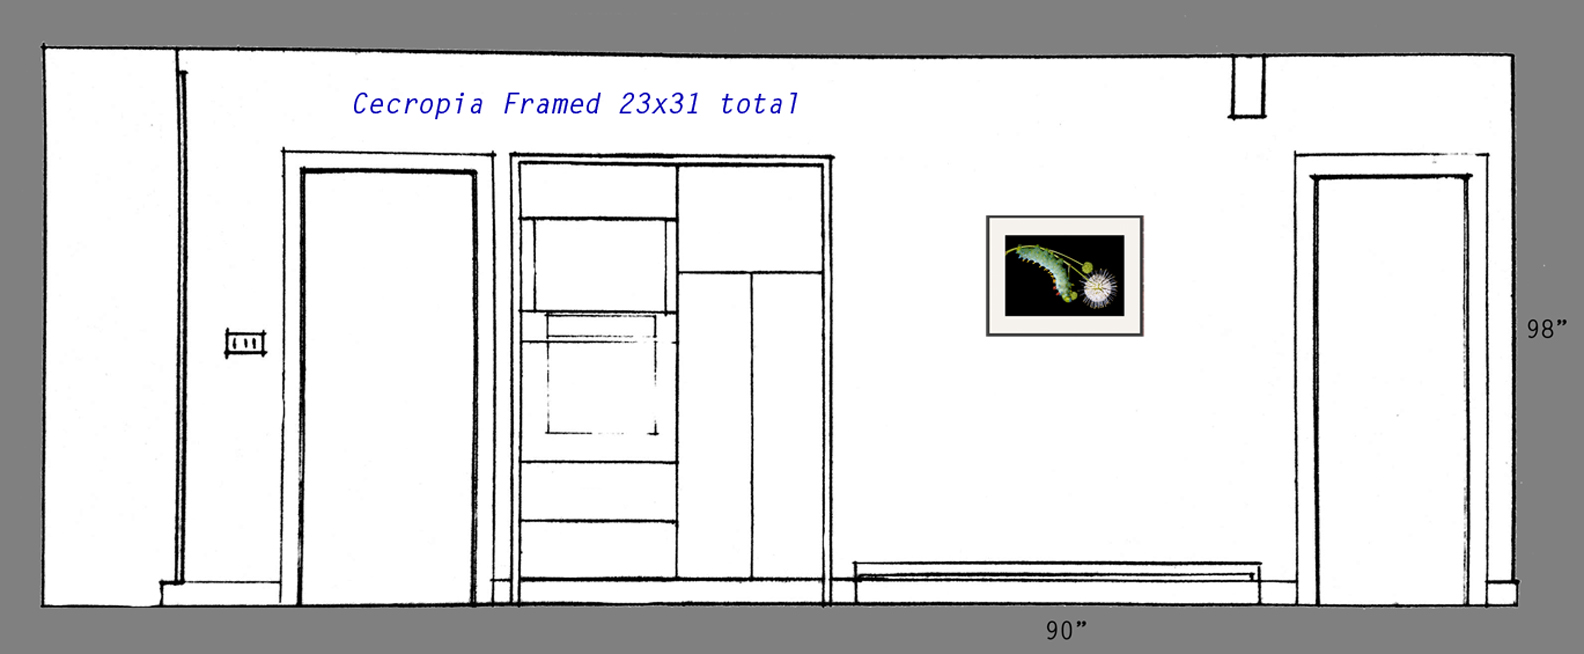 Single 17x25 print framed to 23x31